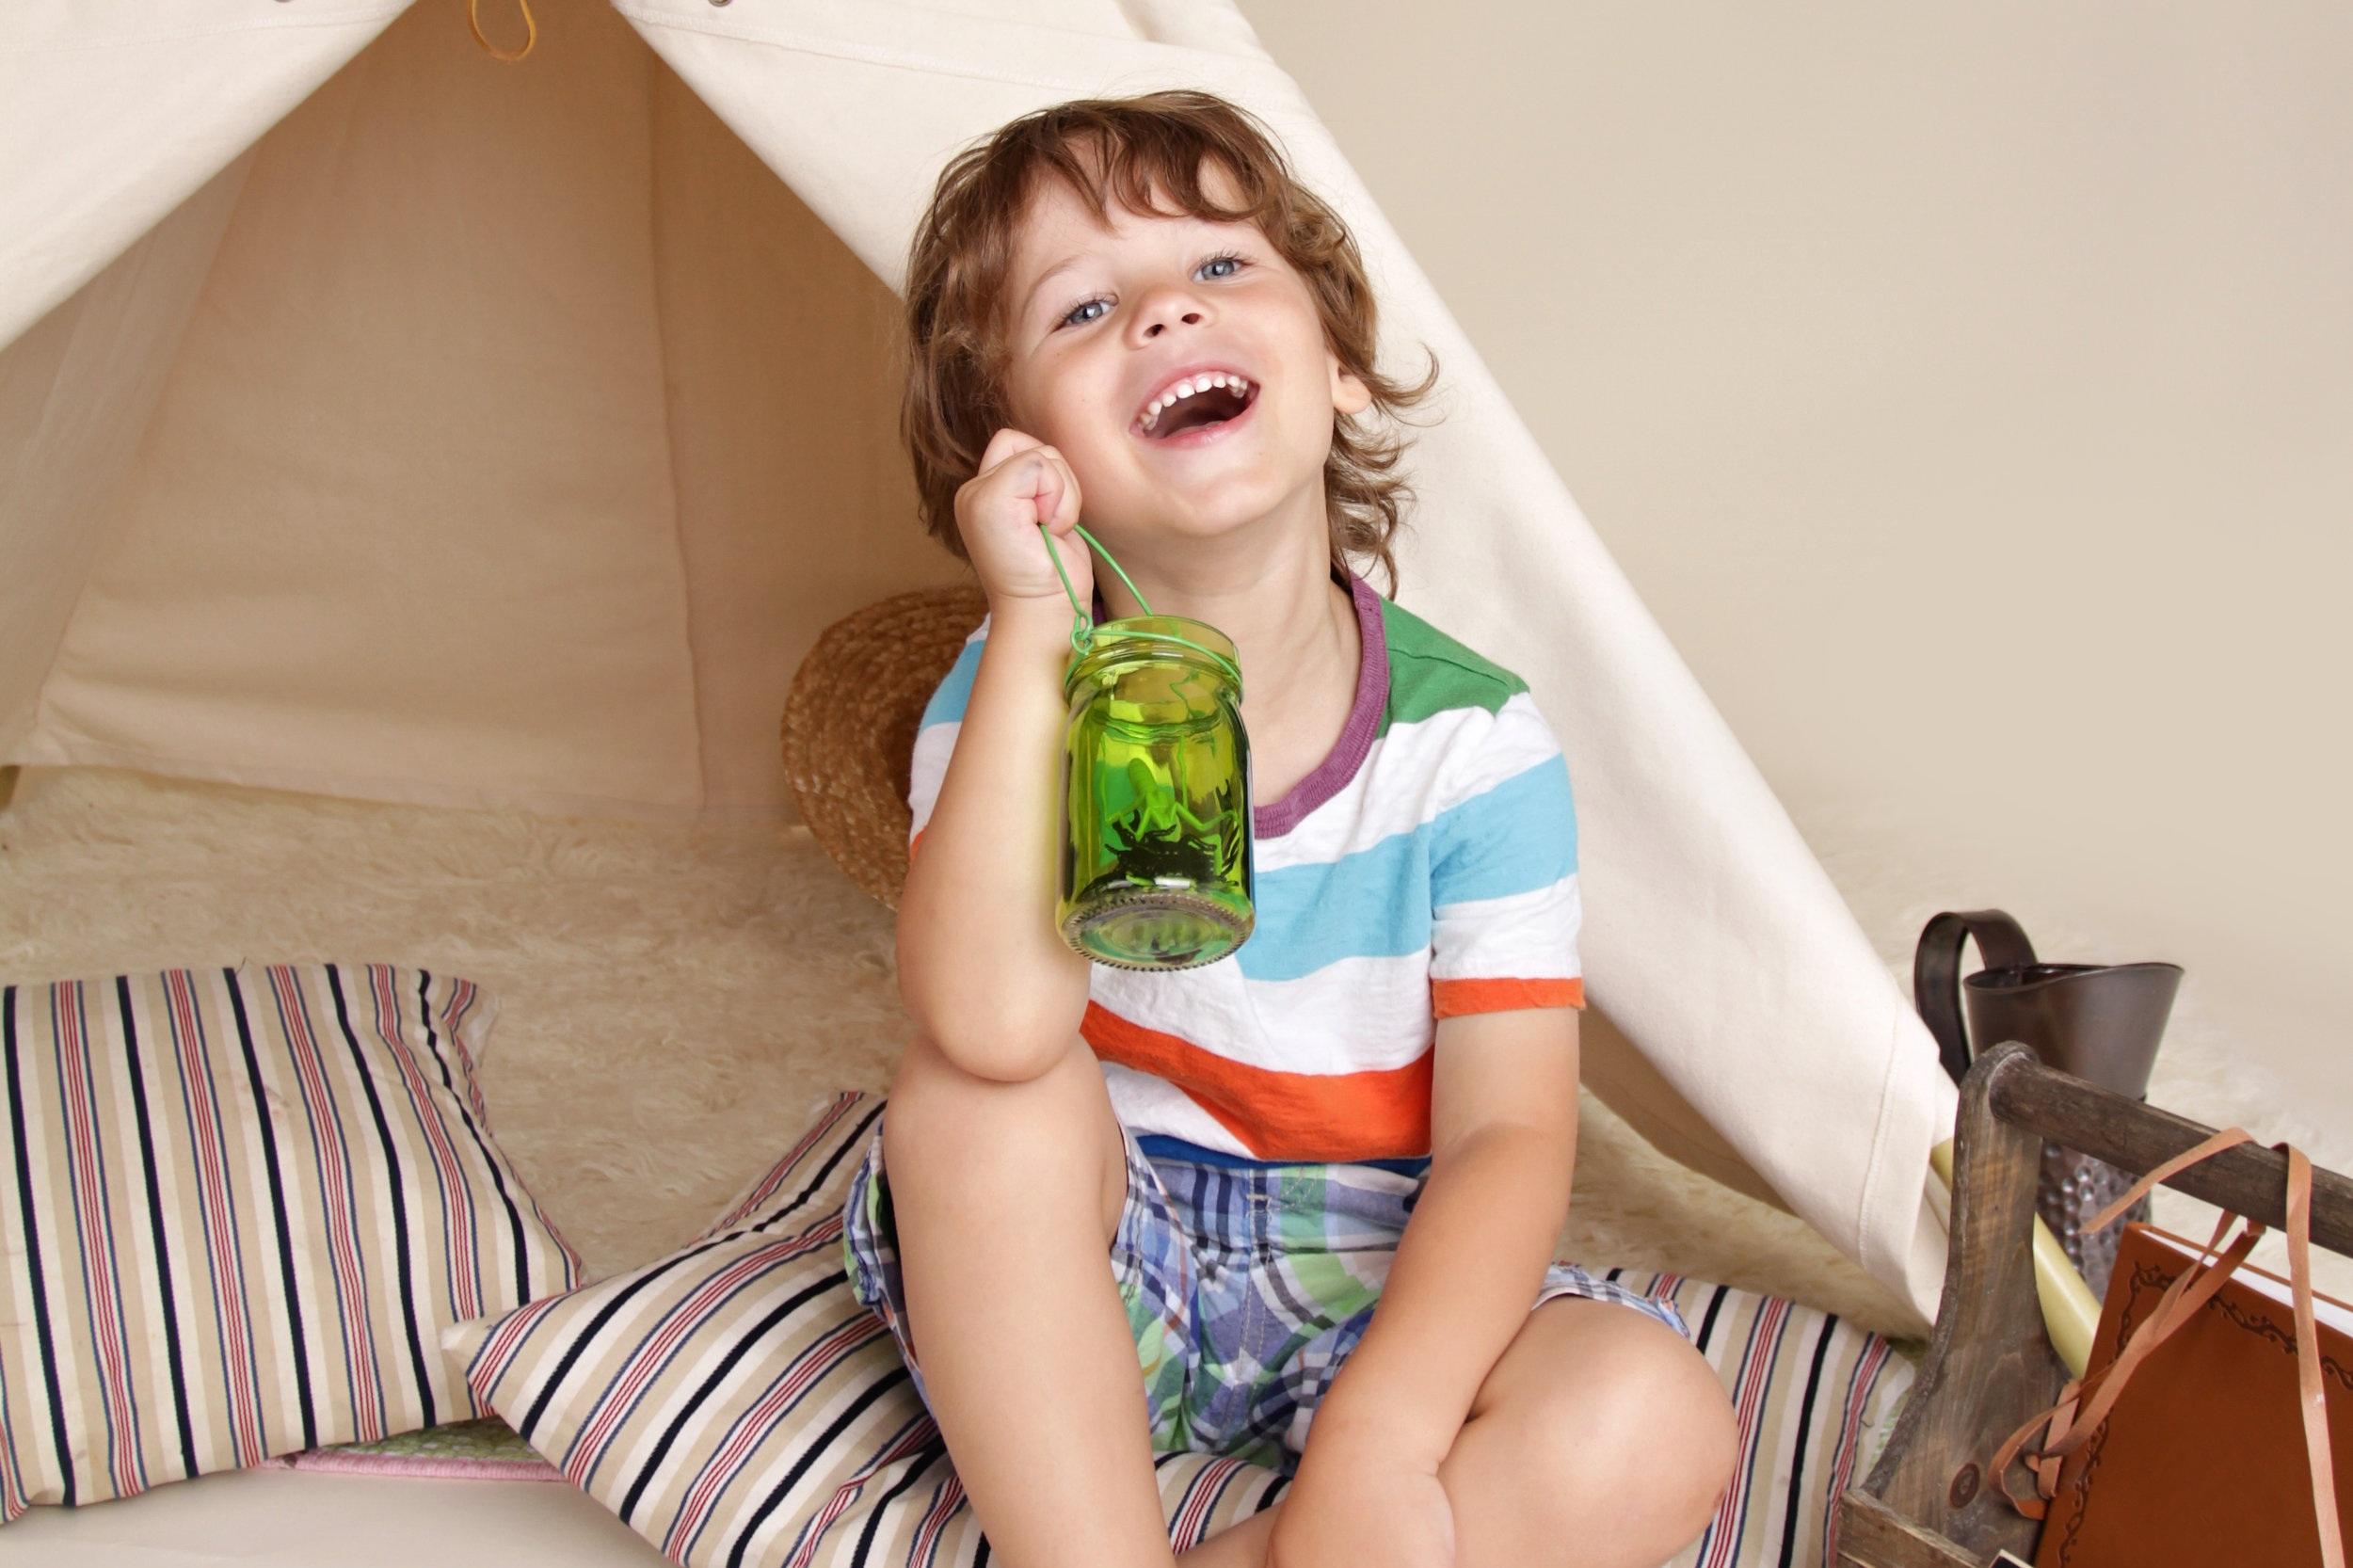 How to beat homeschool cabin fever